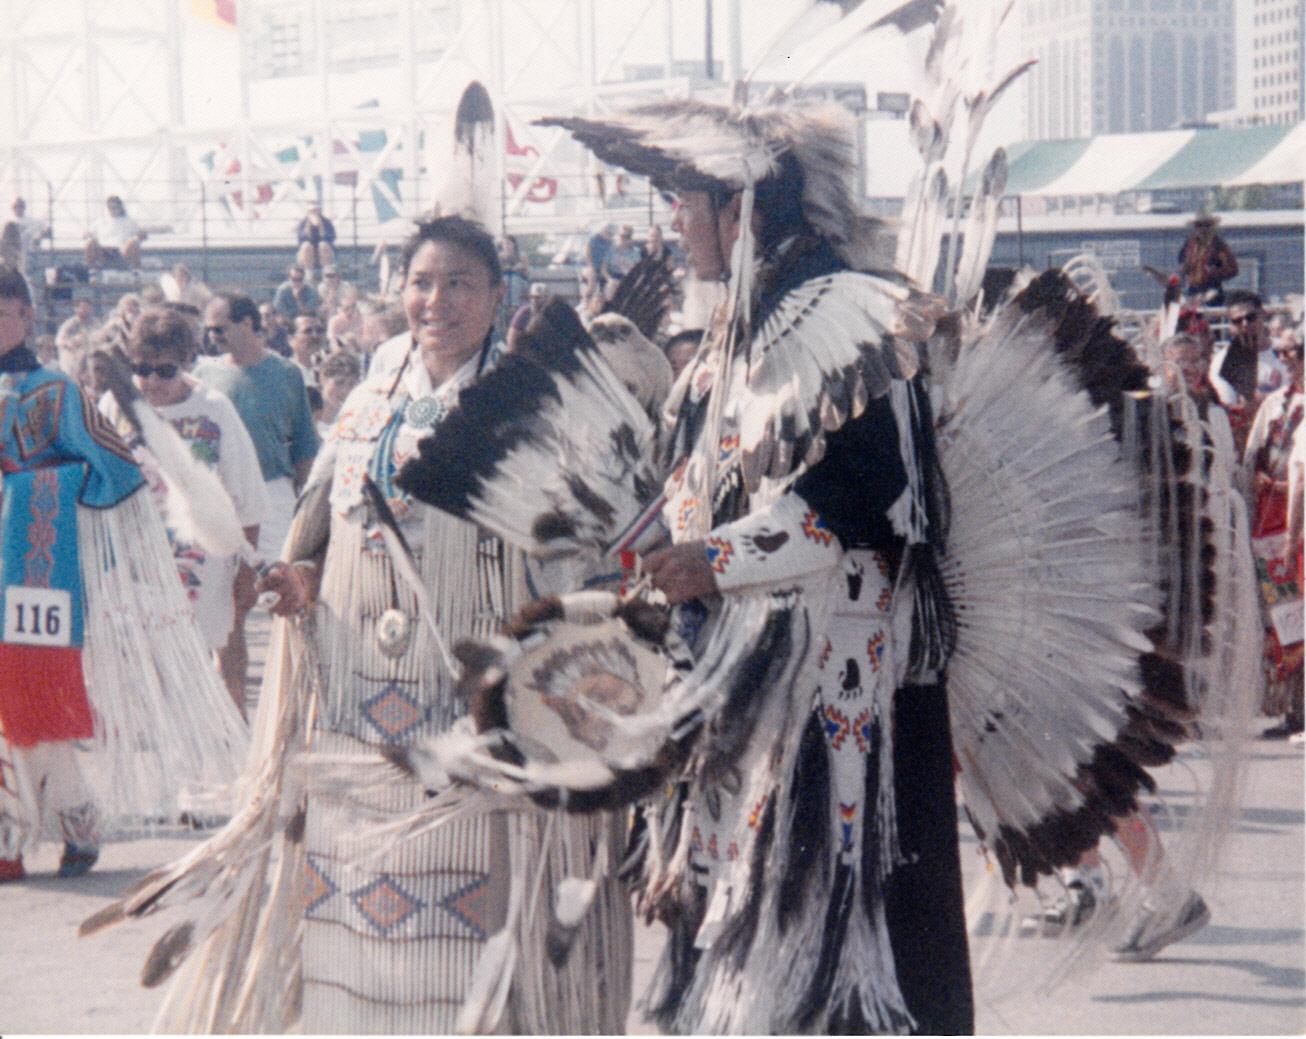 Massachusetts Center for Native American Awareness Native american pow wow photos